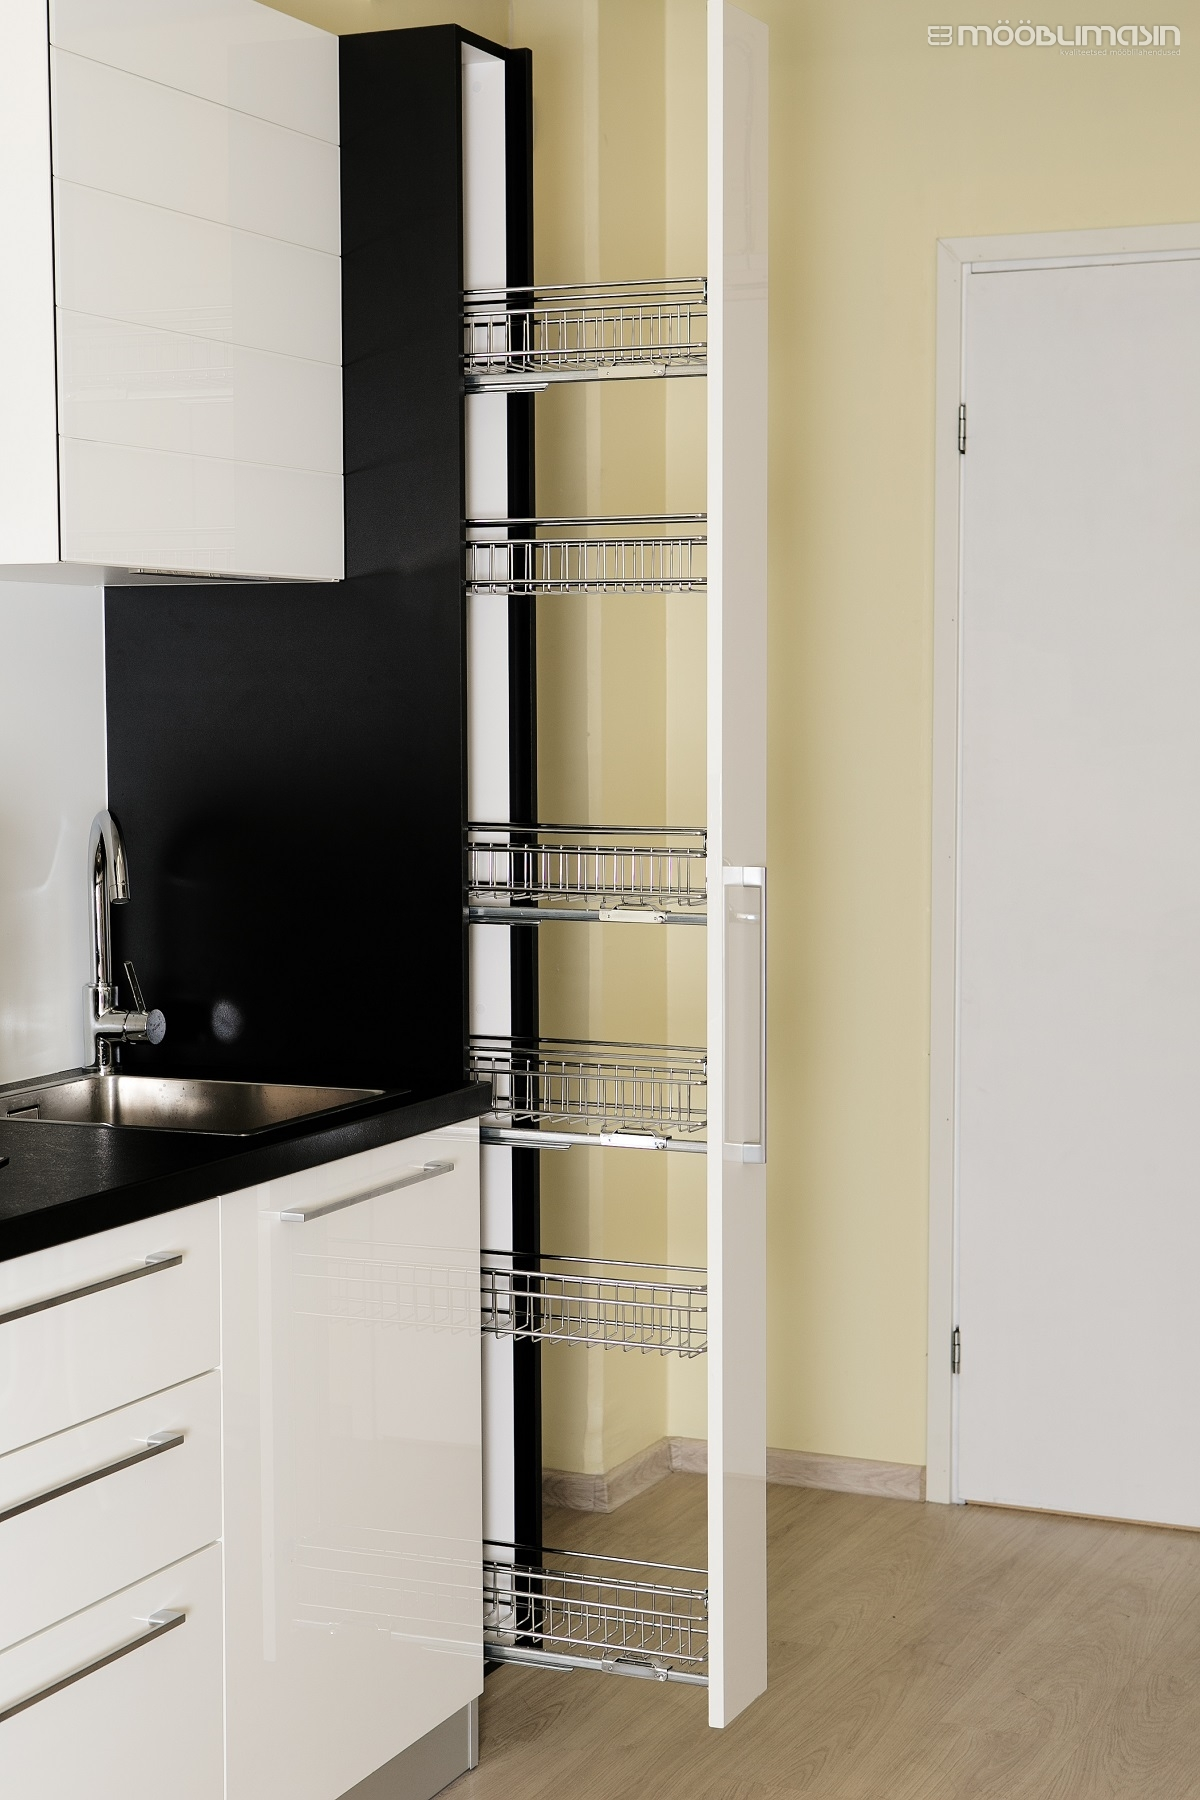 Refinish metal shelves : 150 mm